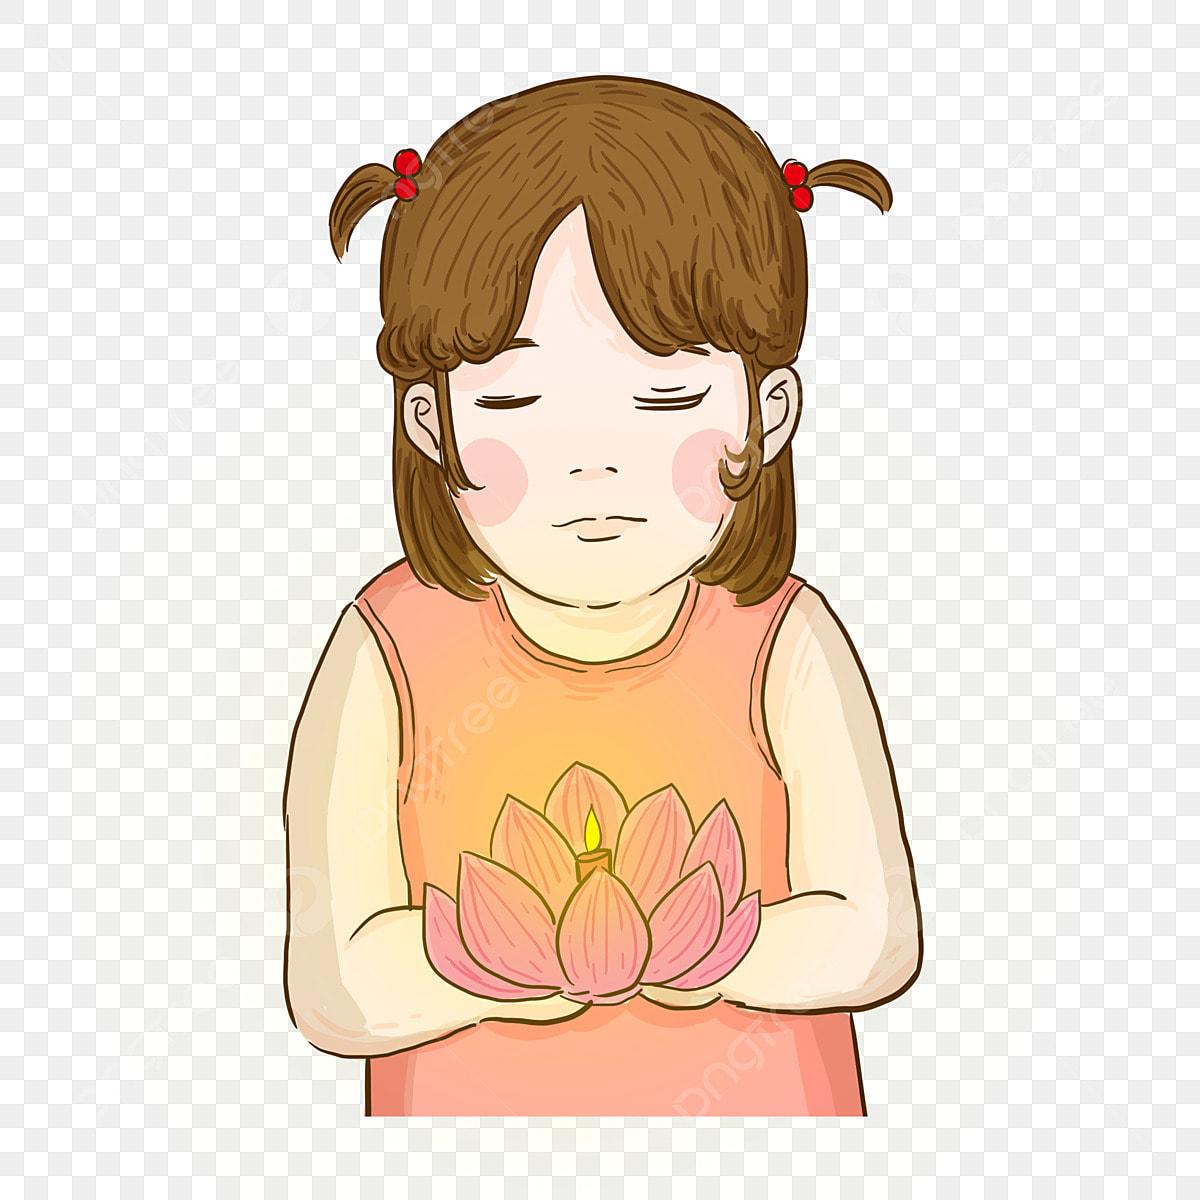 Kartun Gadis Dengan Tanglung Air Butang Gadis Kecil El